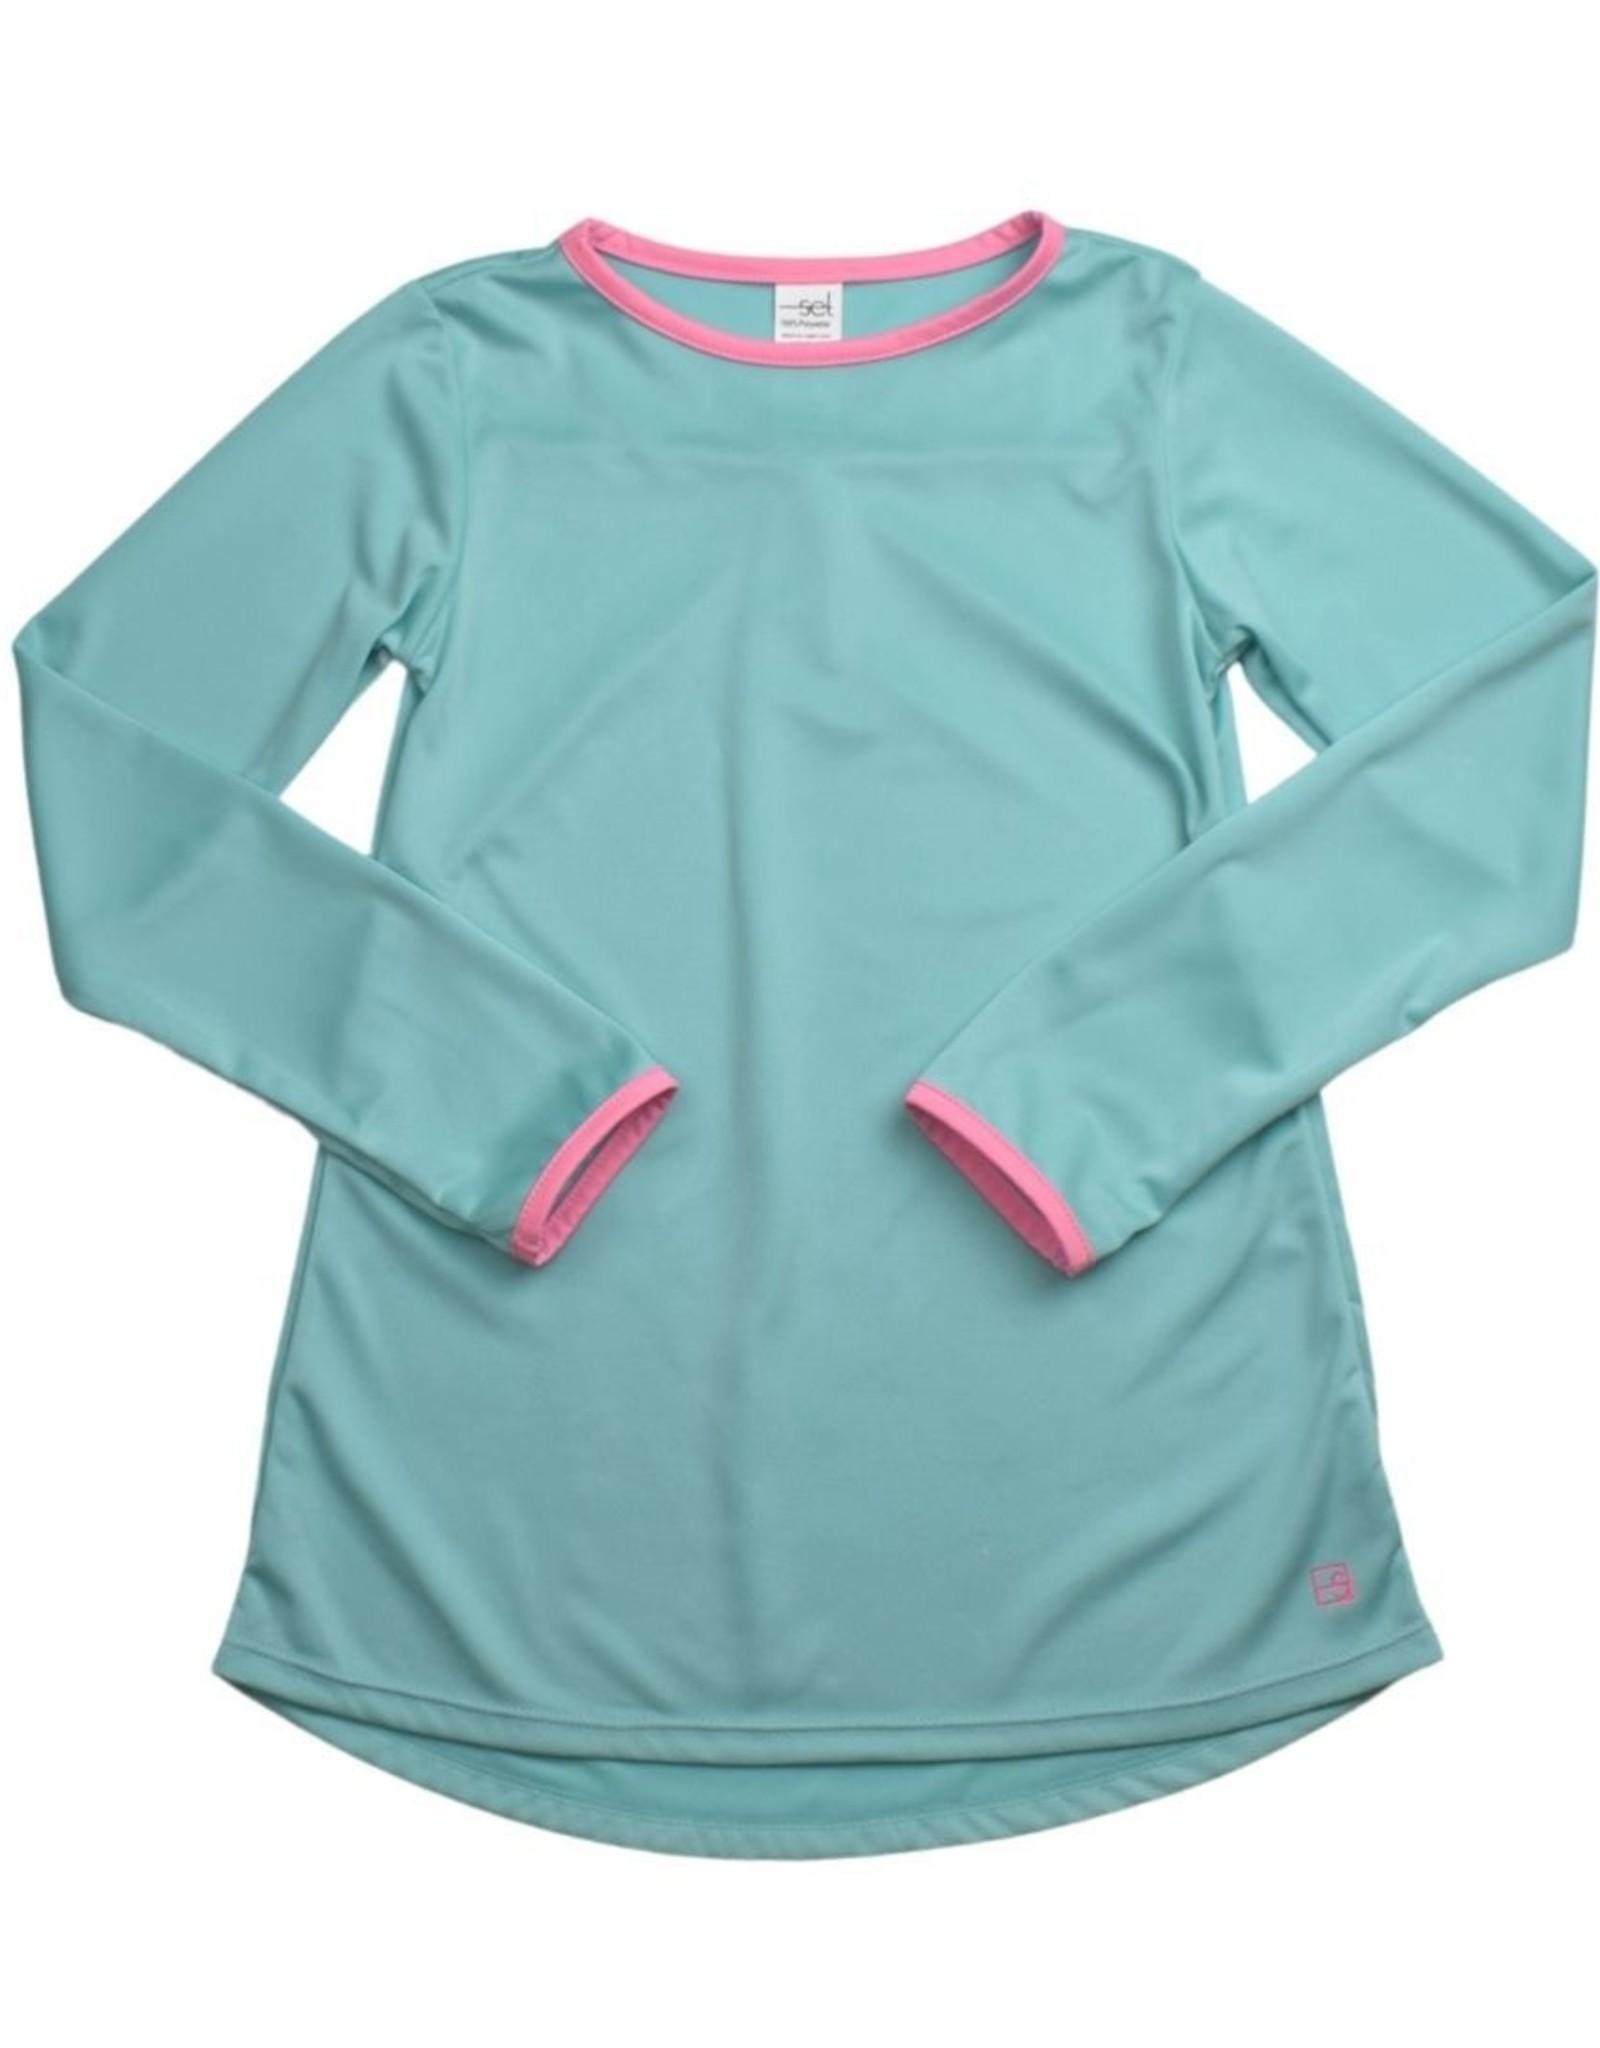 SET Lindsay Long T LS - Turquoise w/ Pink Welting